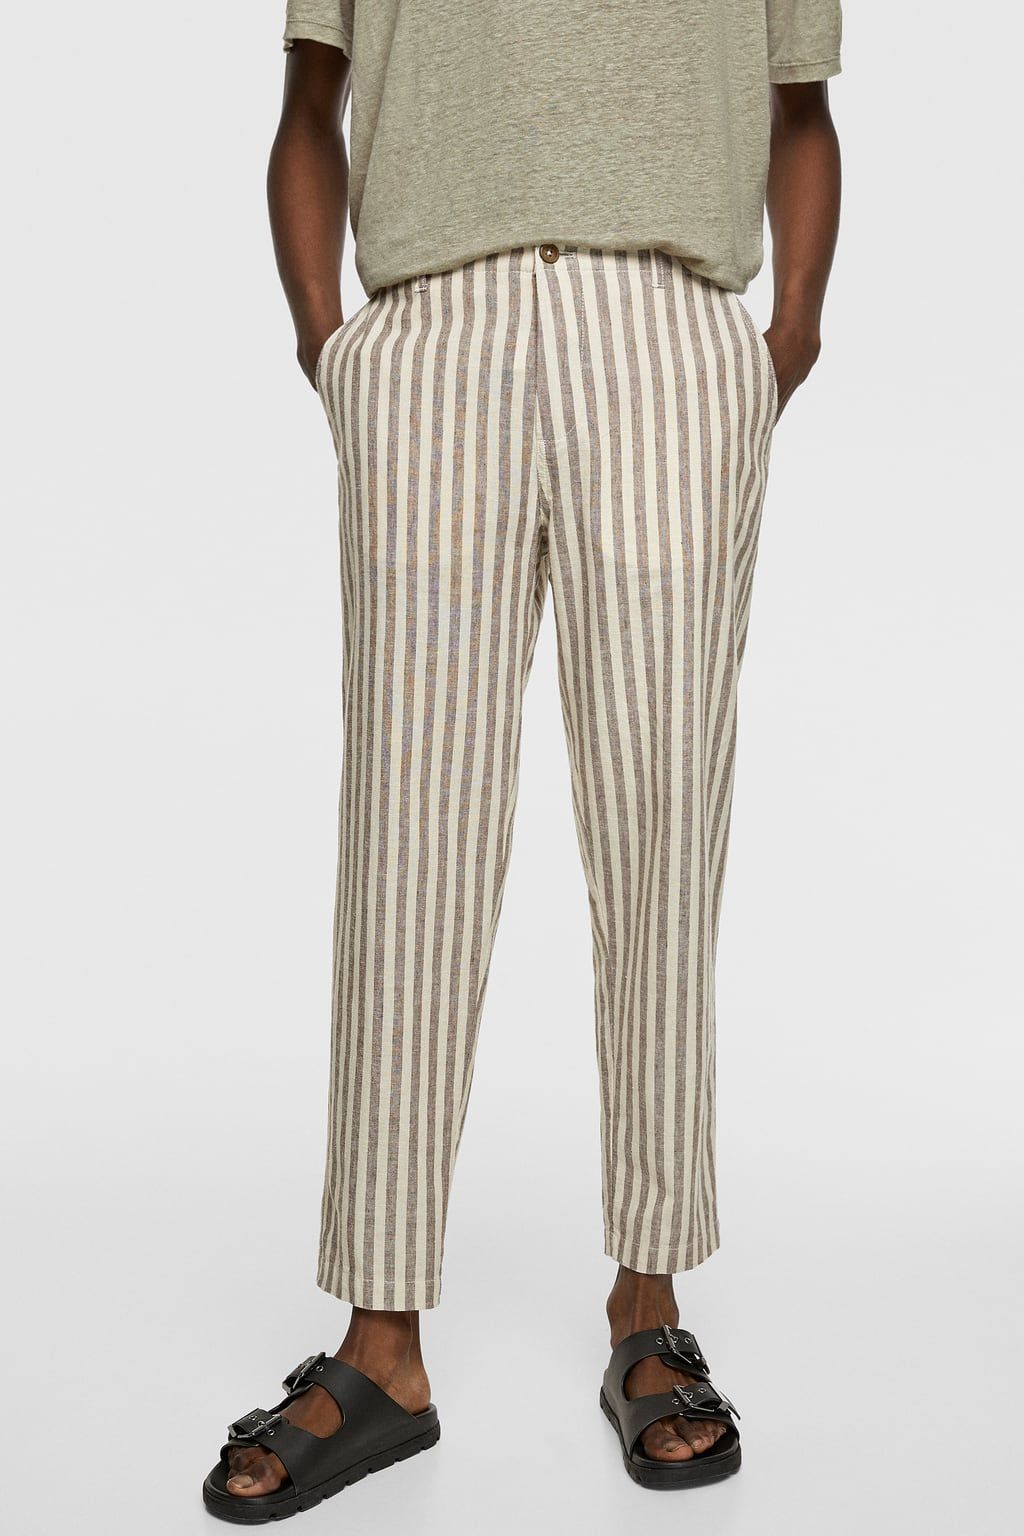 Pantalon Rustico Rayas Ultima Semana Hombre Zara Mexico Pantalones Casuales Casual Hombre Pantalones